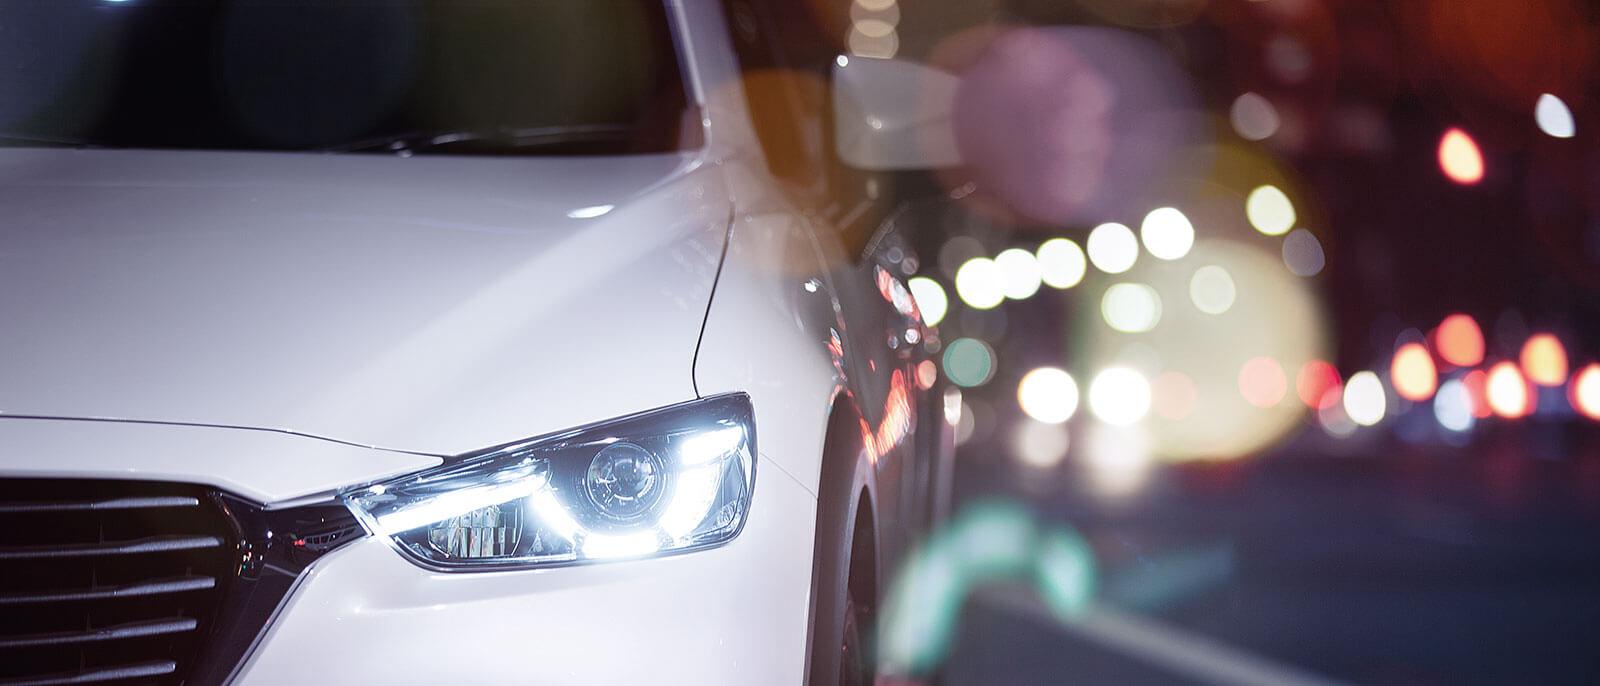 2017 Mazda CX-3 headlight